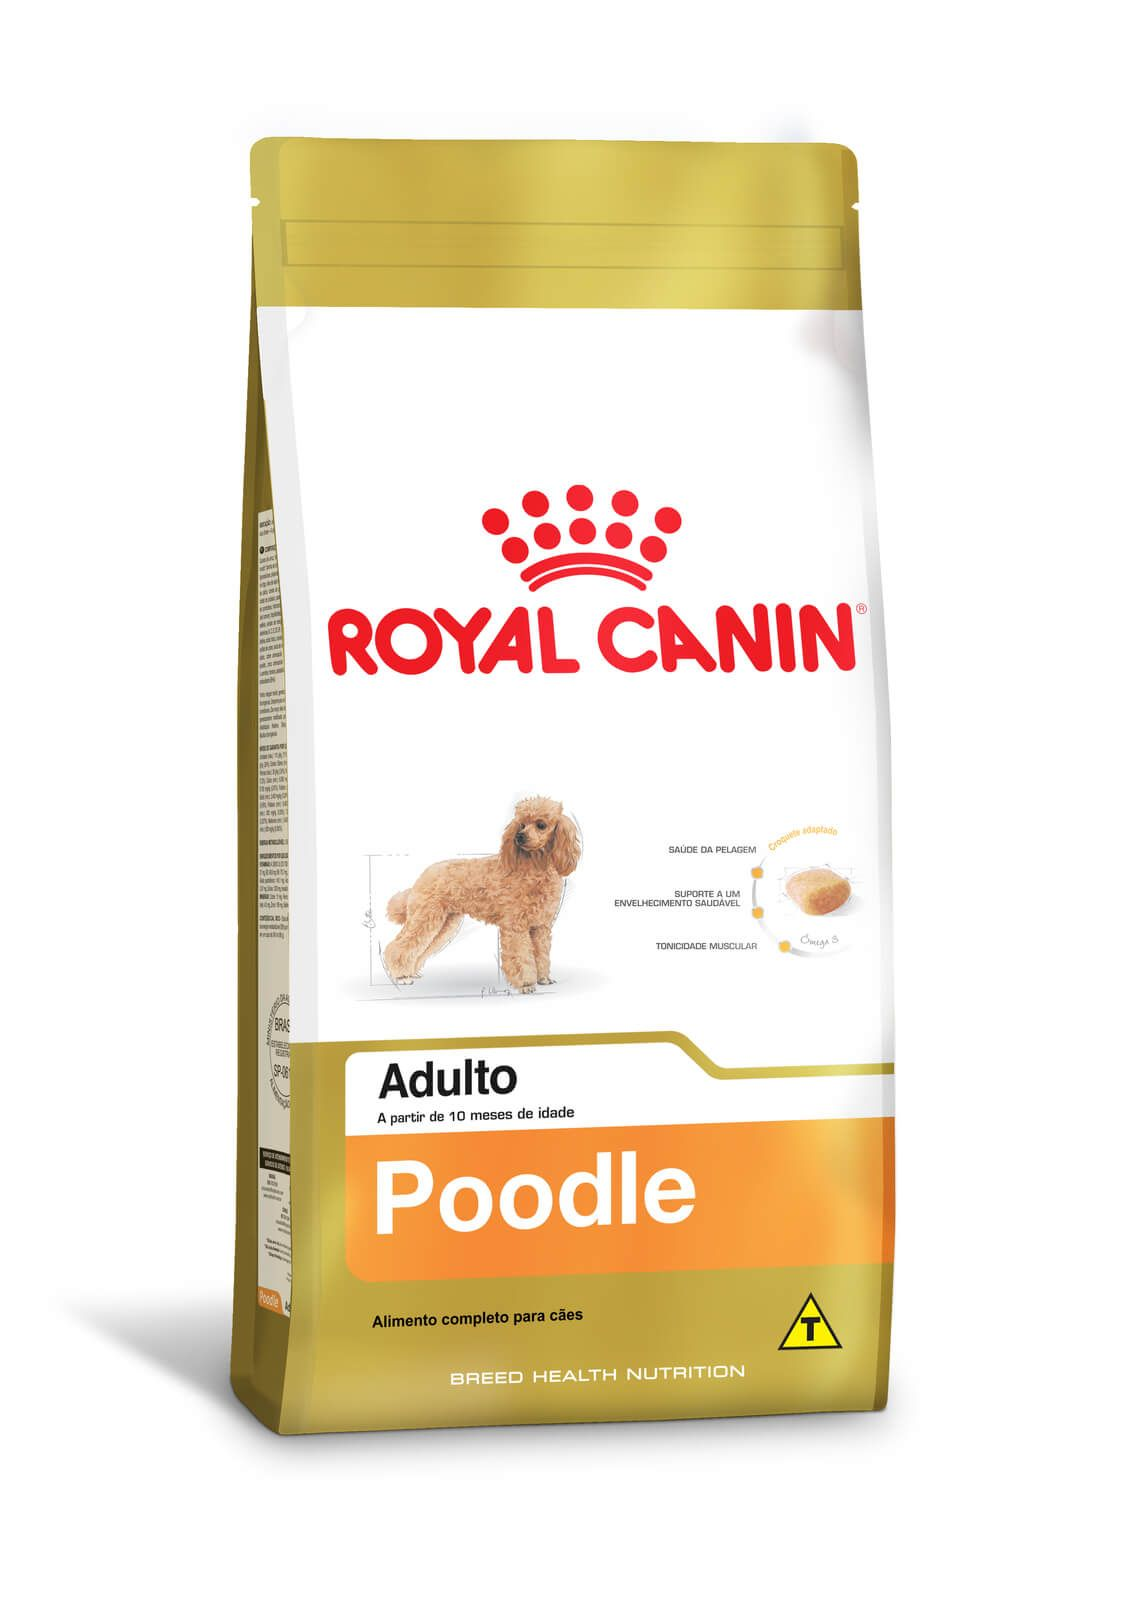 Ração Royal Canin Poodle Adult